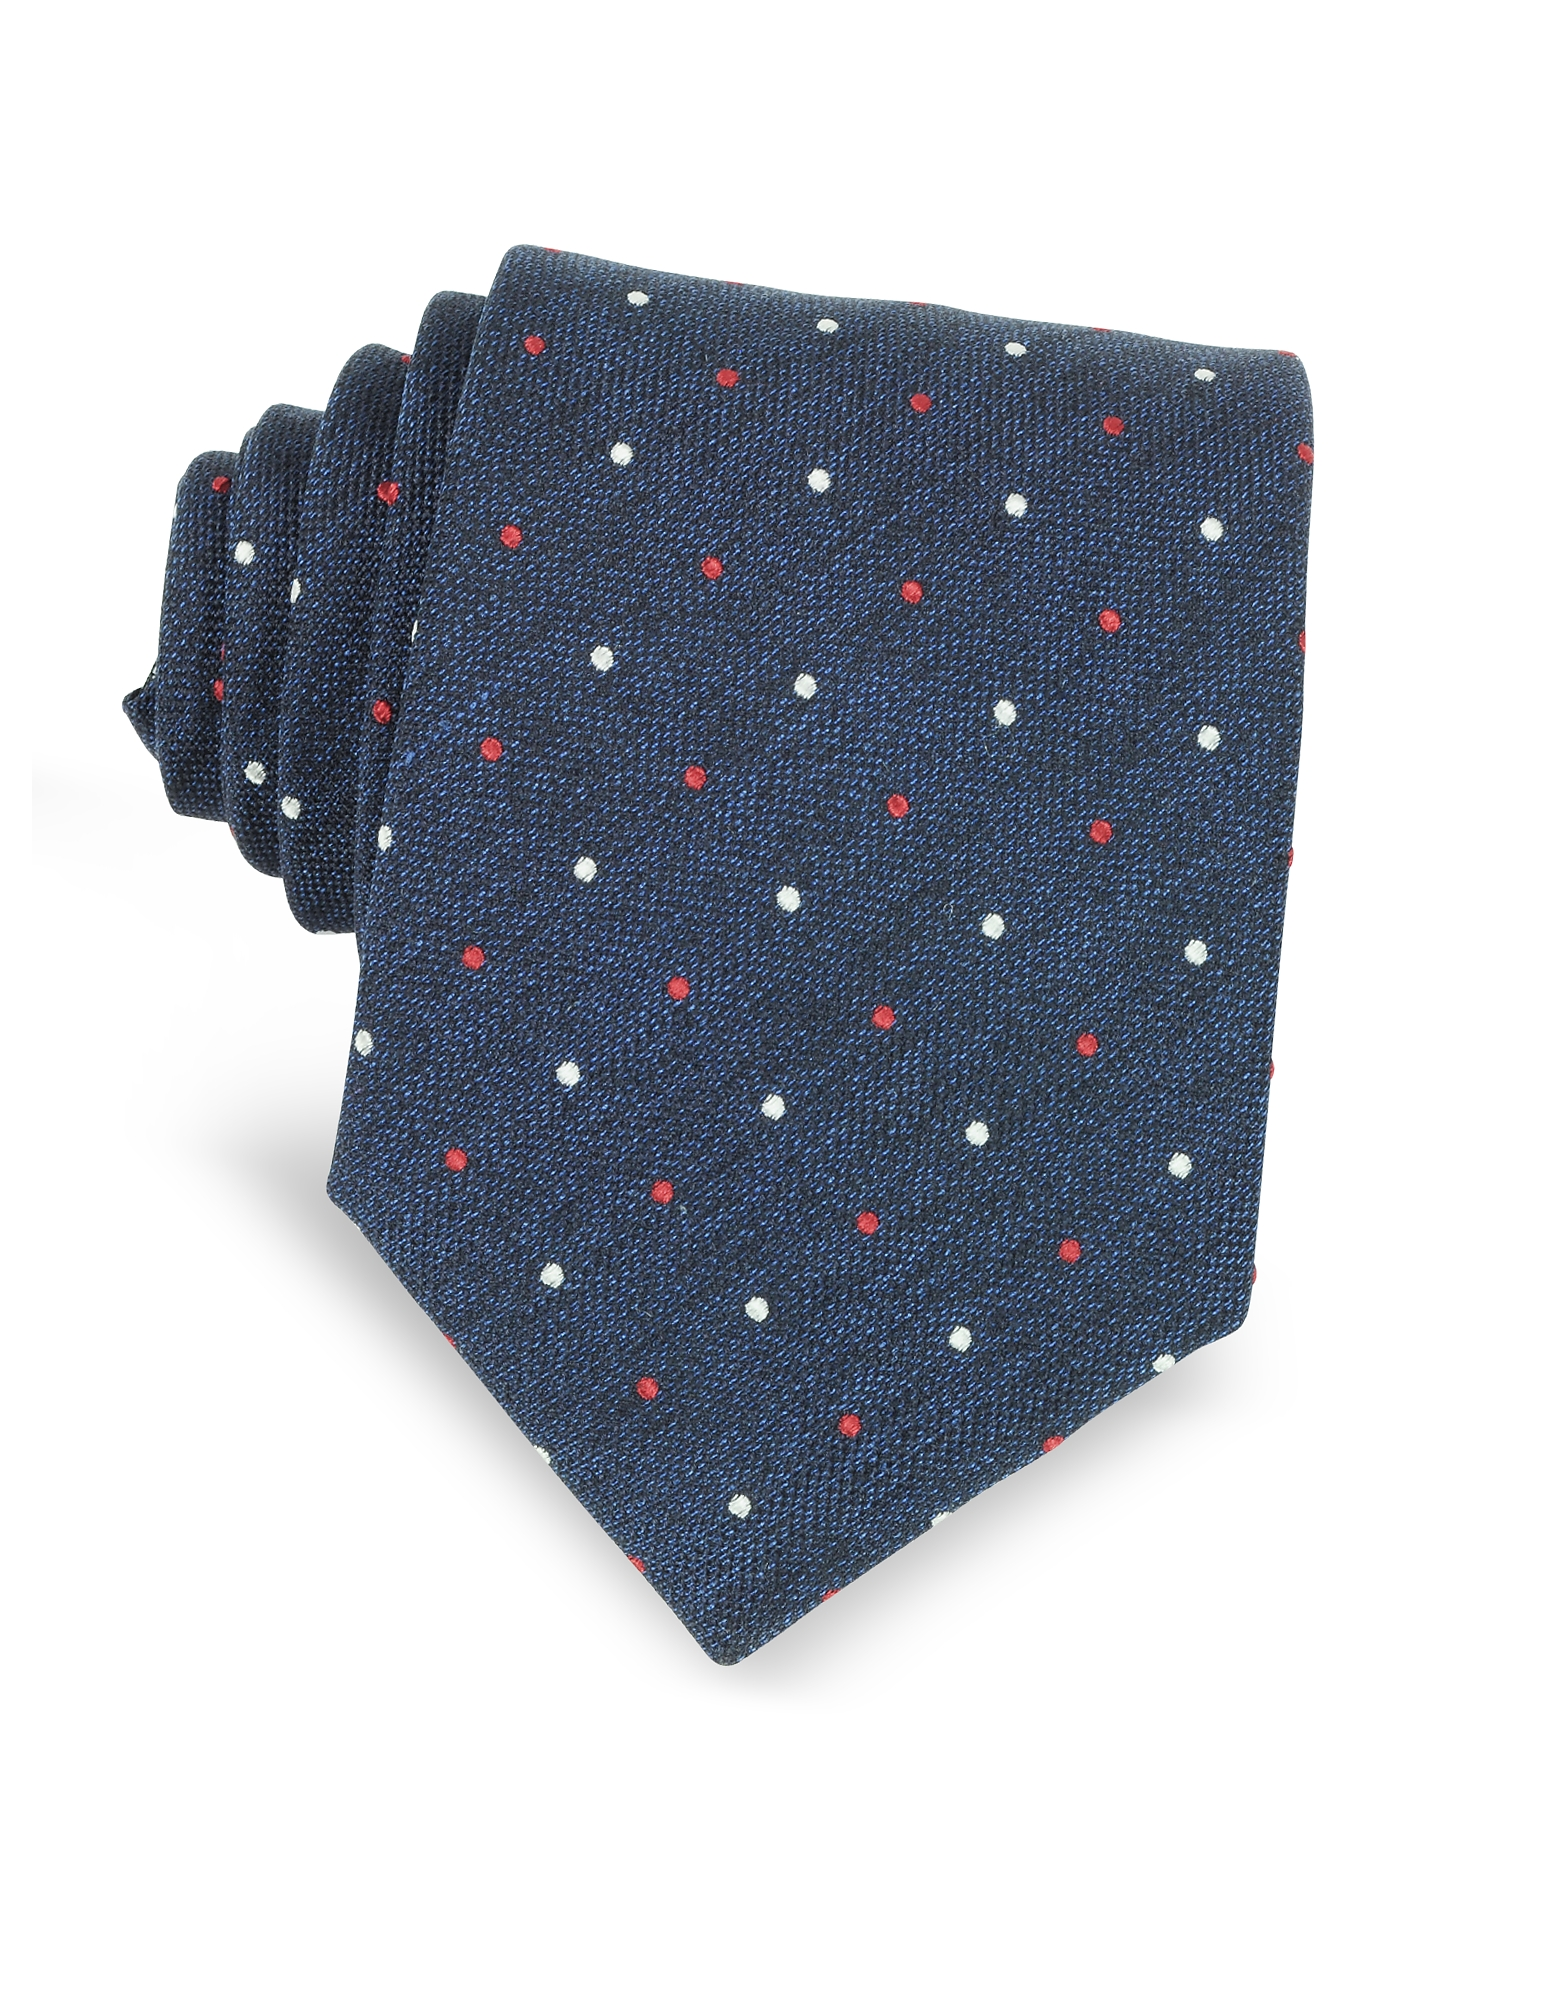 Forzieri Ties, Polka-dots Woven Silk Tie